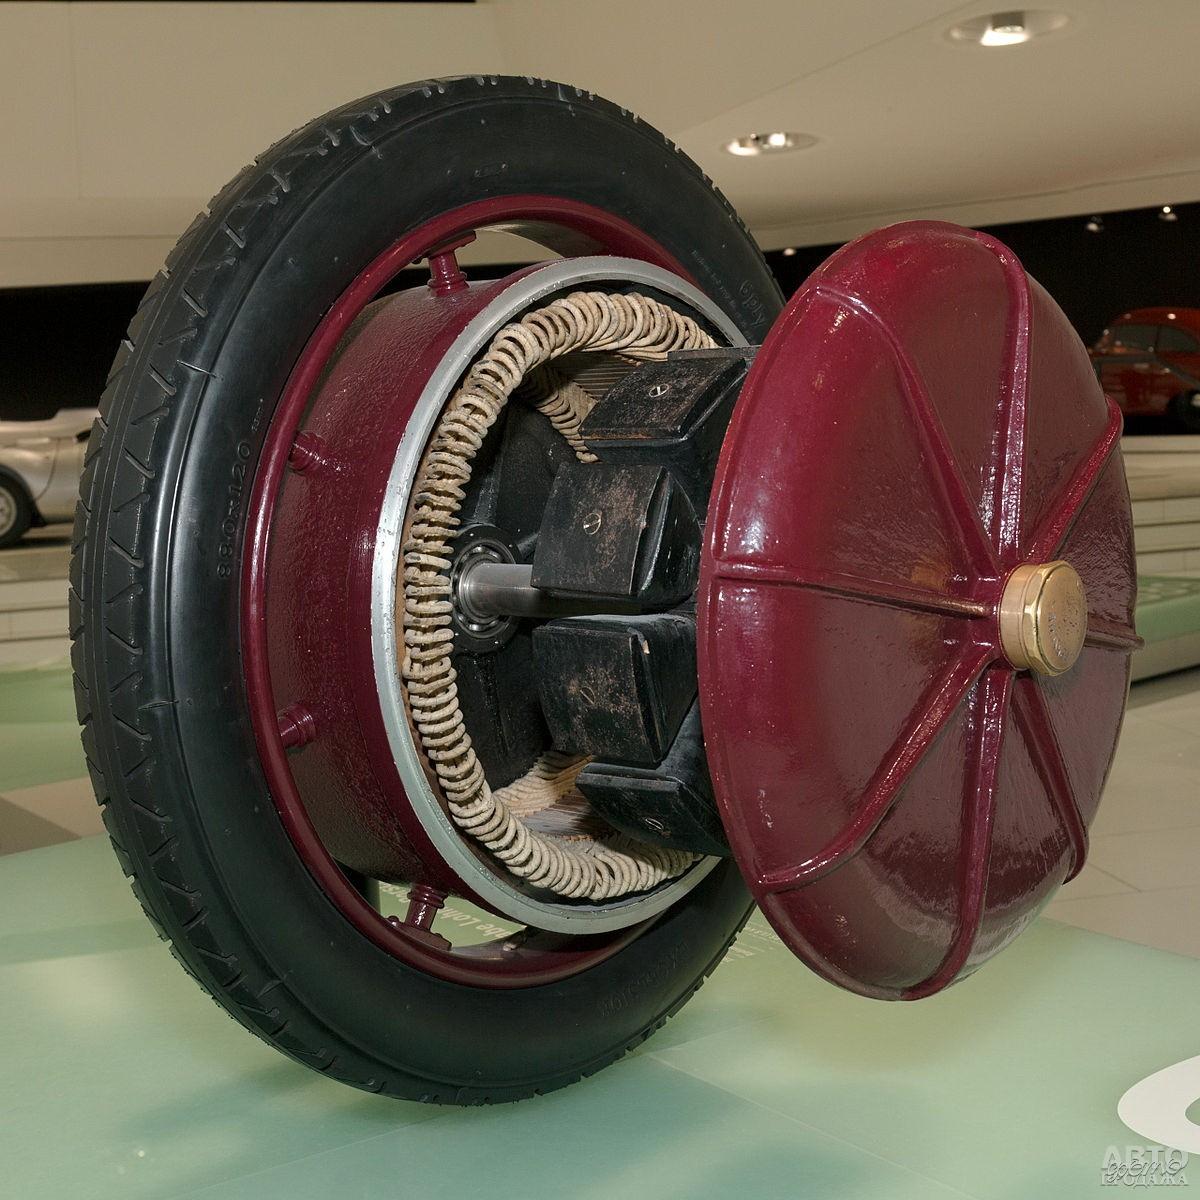 Мотор-колесо – изобретение Фердинанда Порше